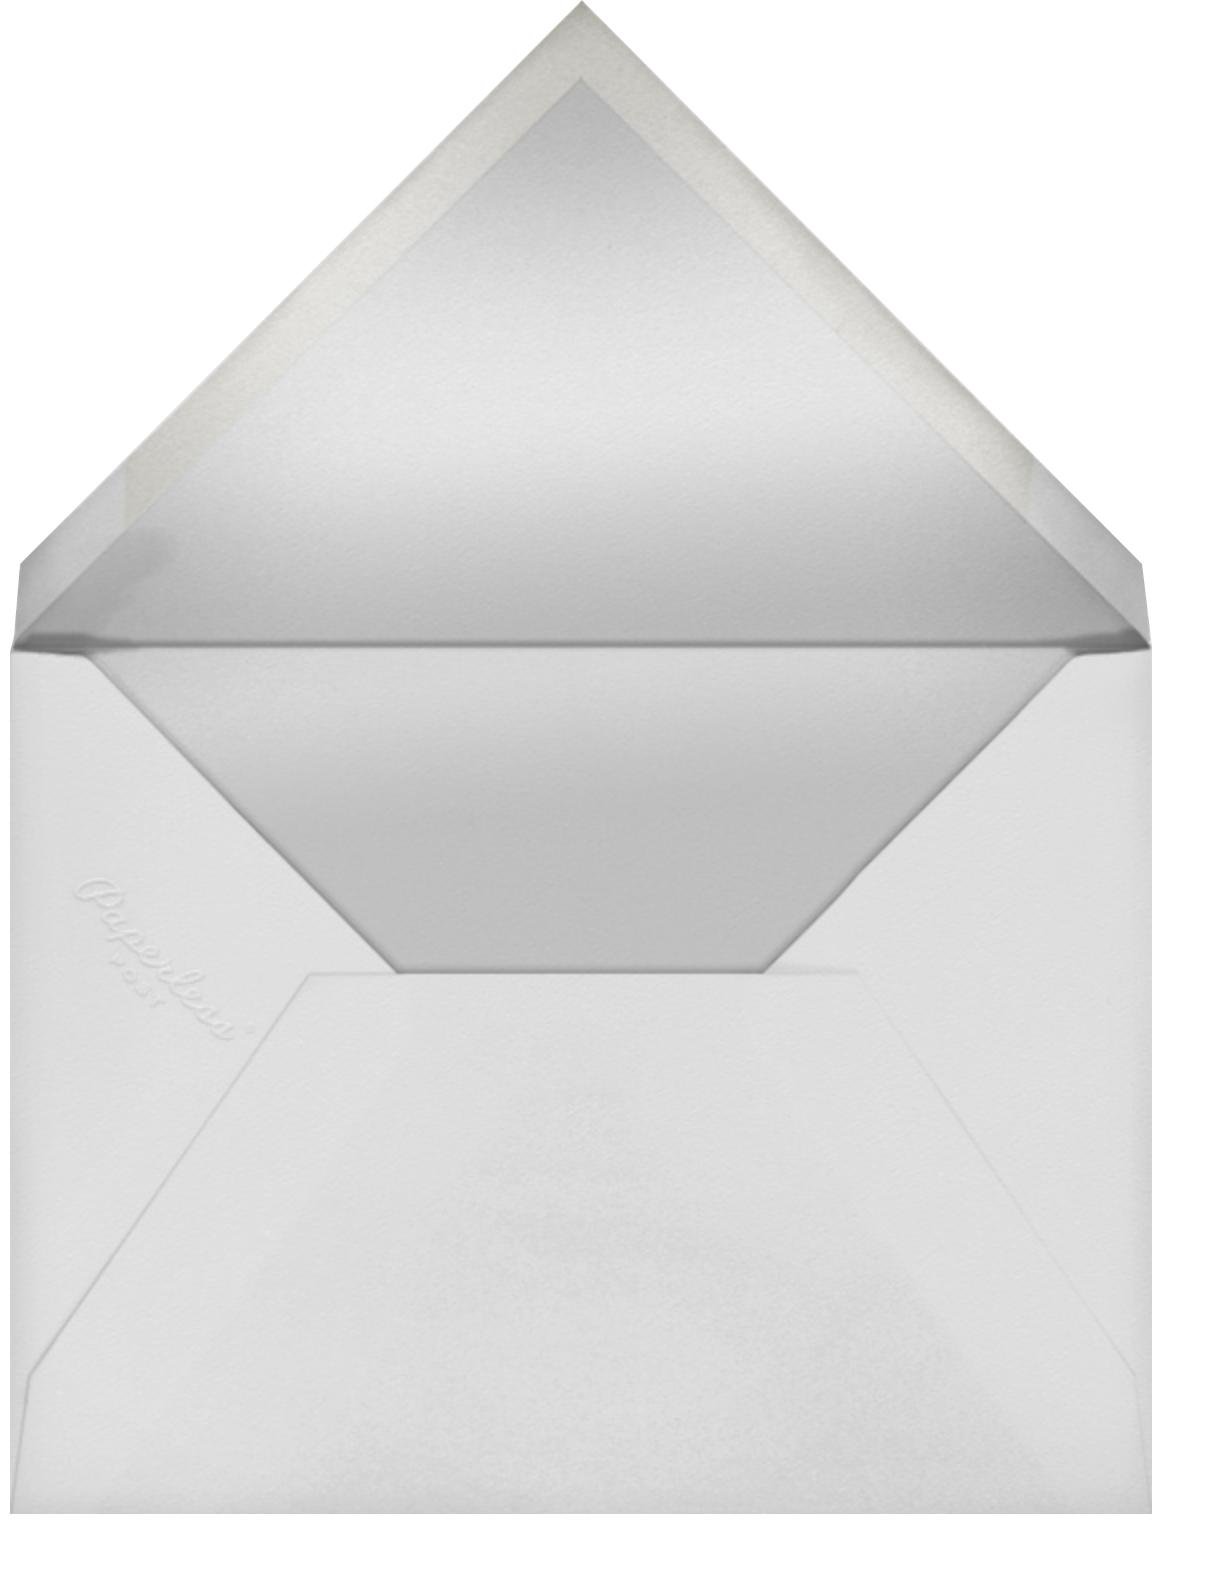 Dahlias (Menu) - Pink - Paperless Post - Menus - envelope back